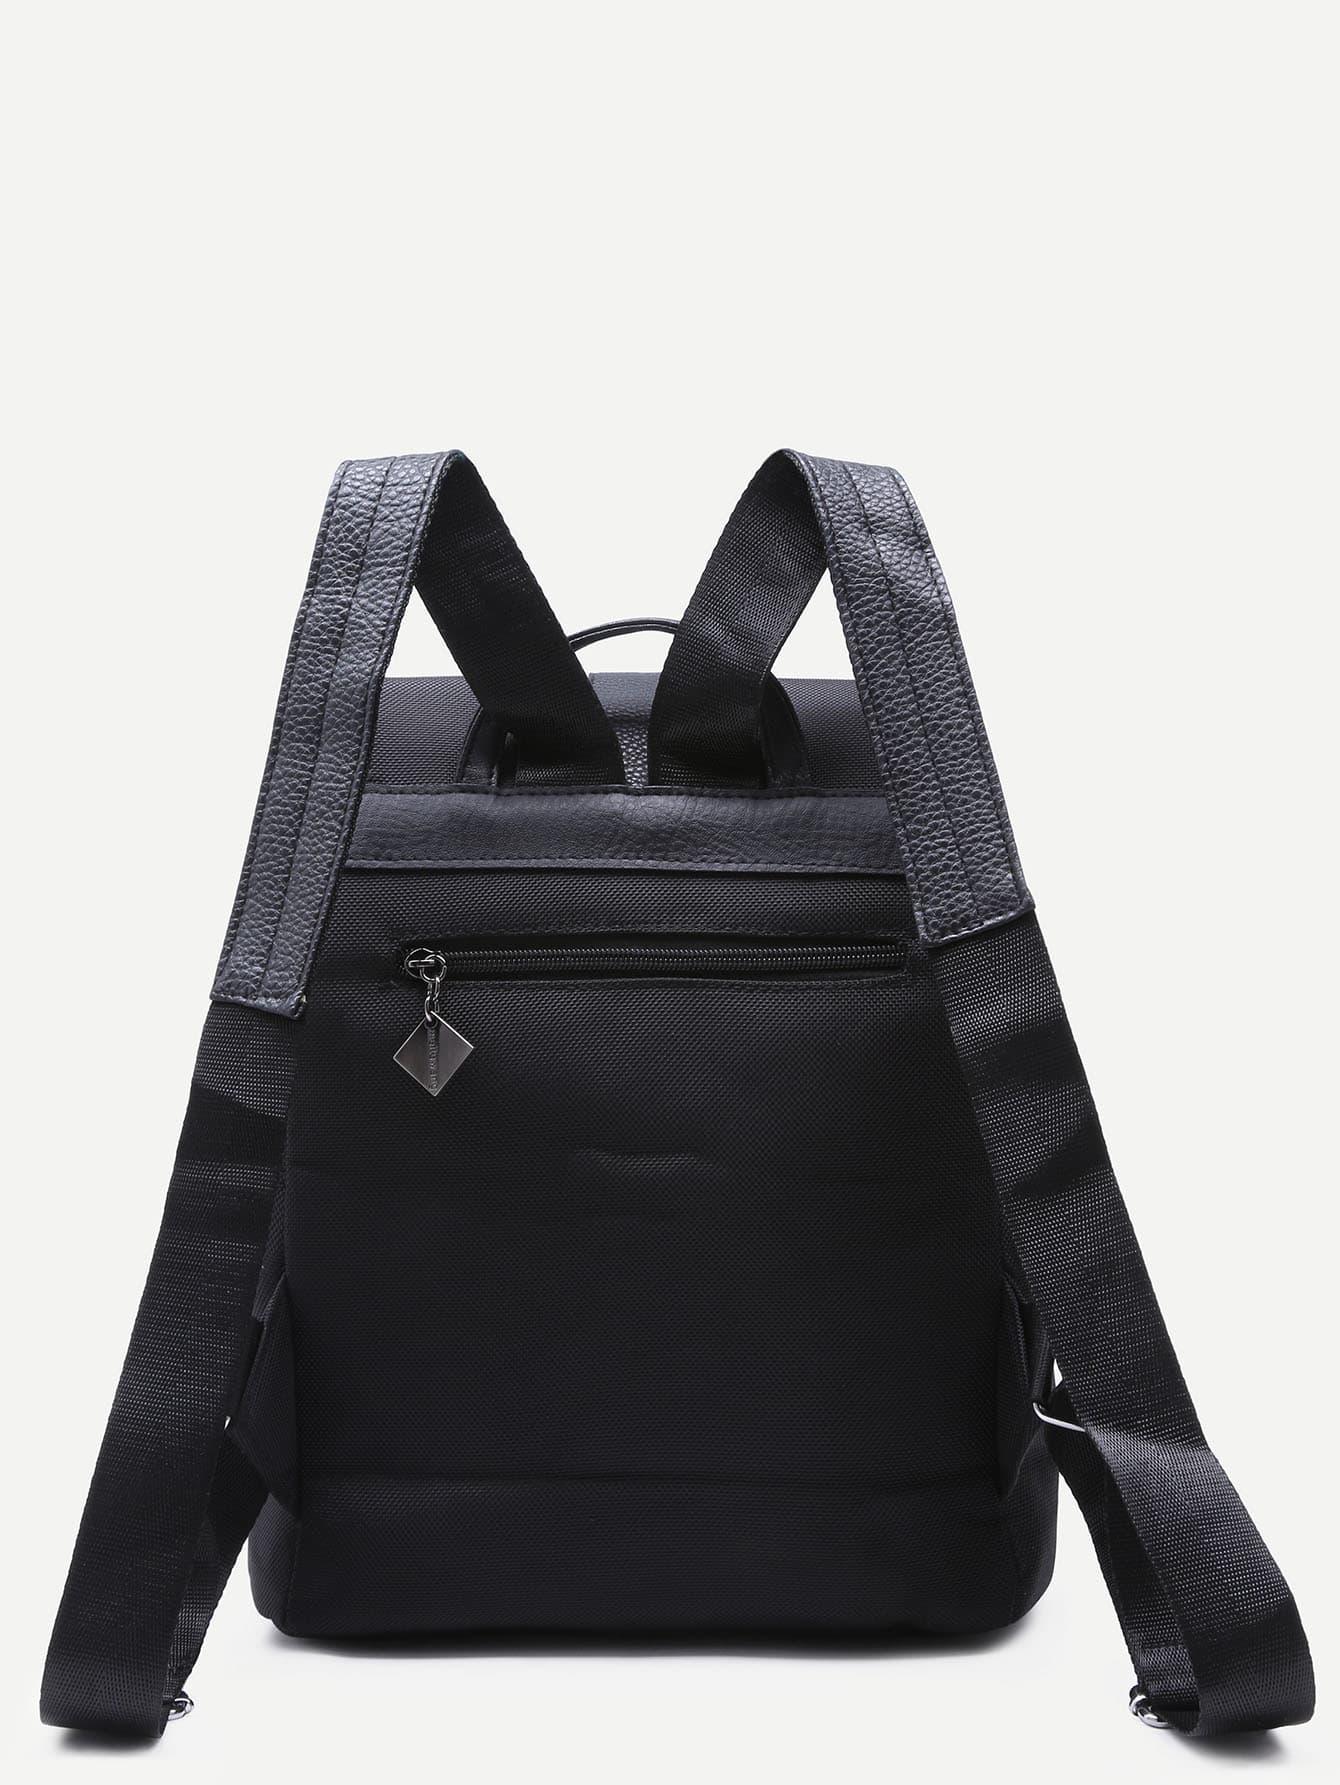 bag160929001_2